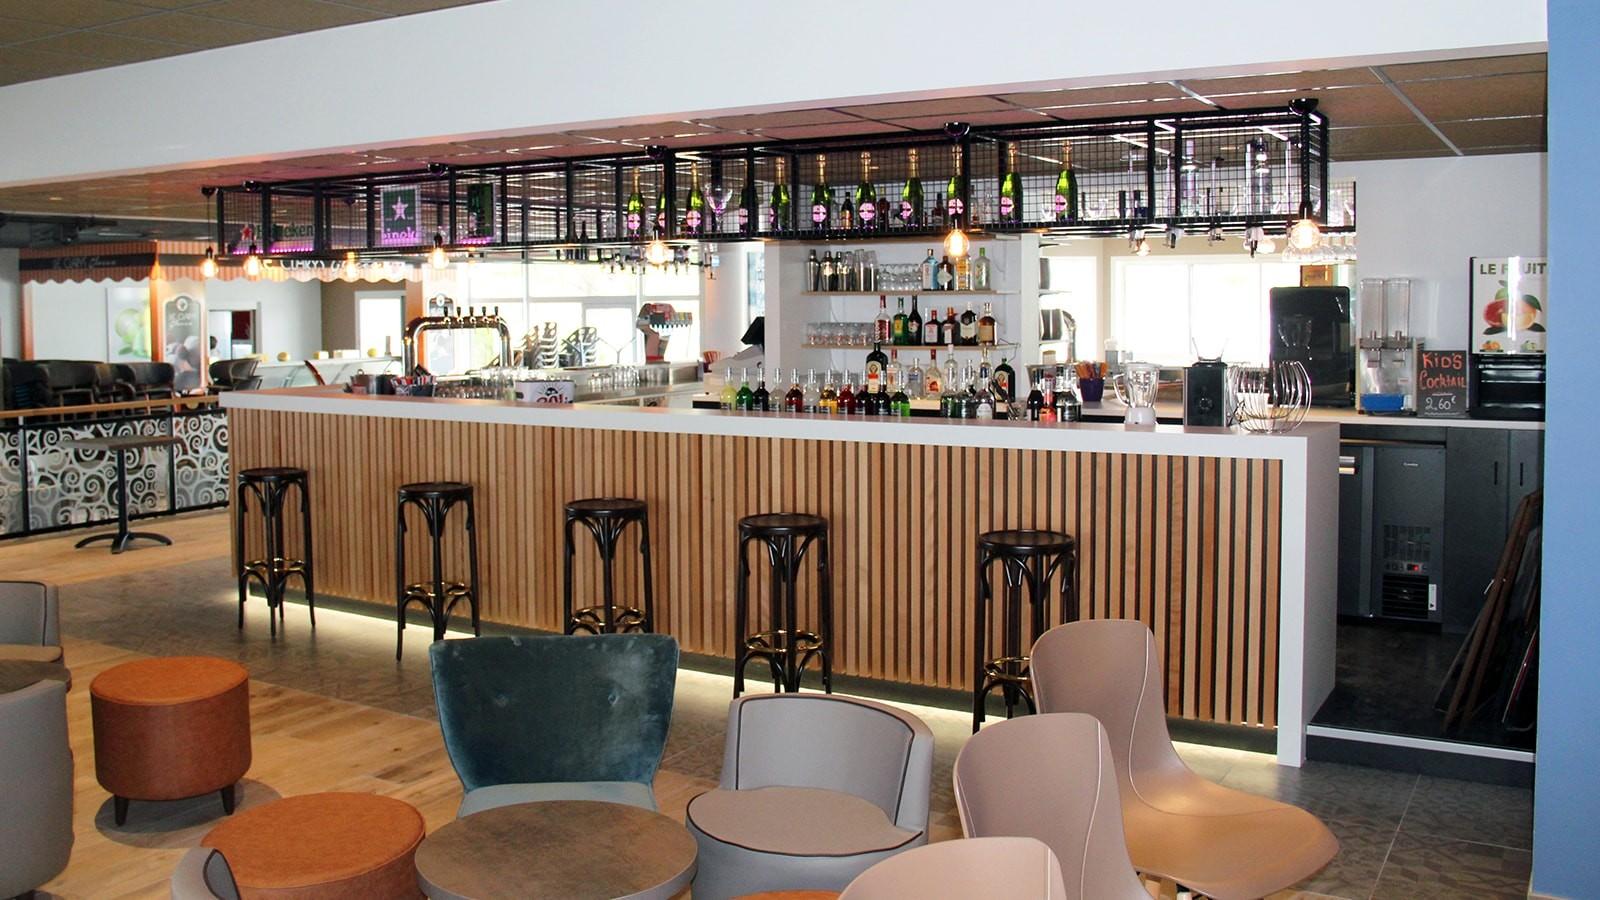 EFI Design Bar Clarys Saint Jean De Monts Efi Design (5) 1214